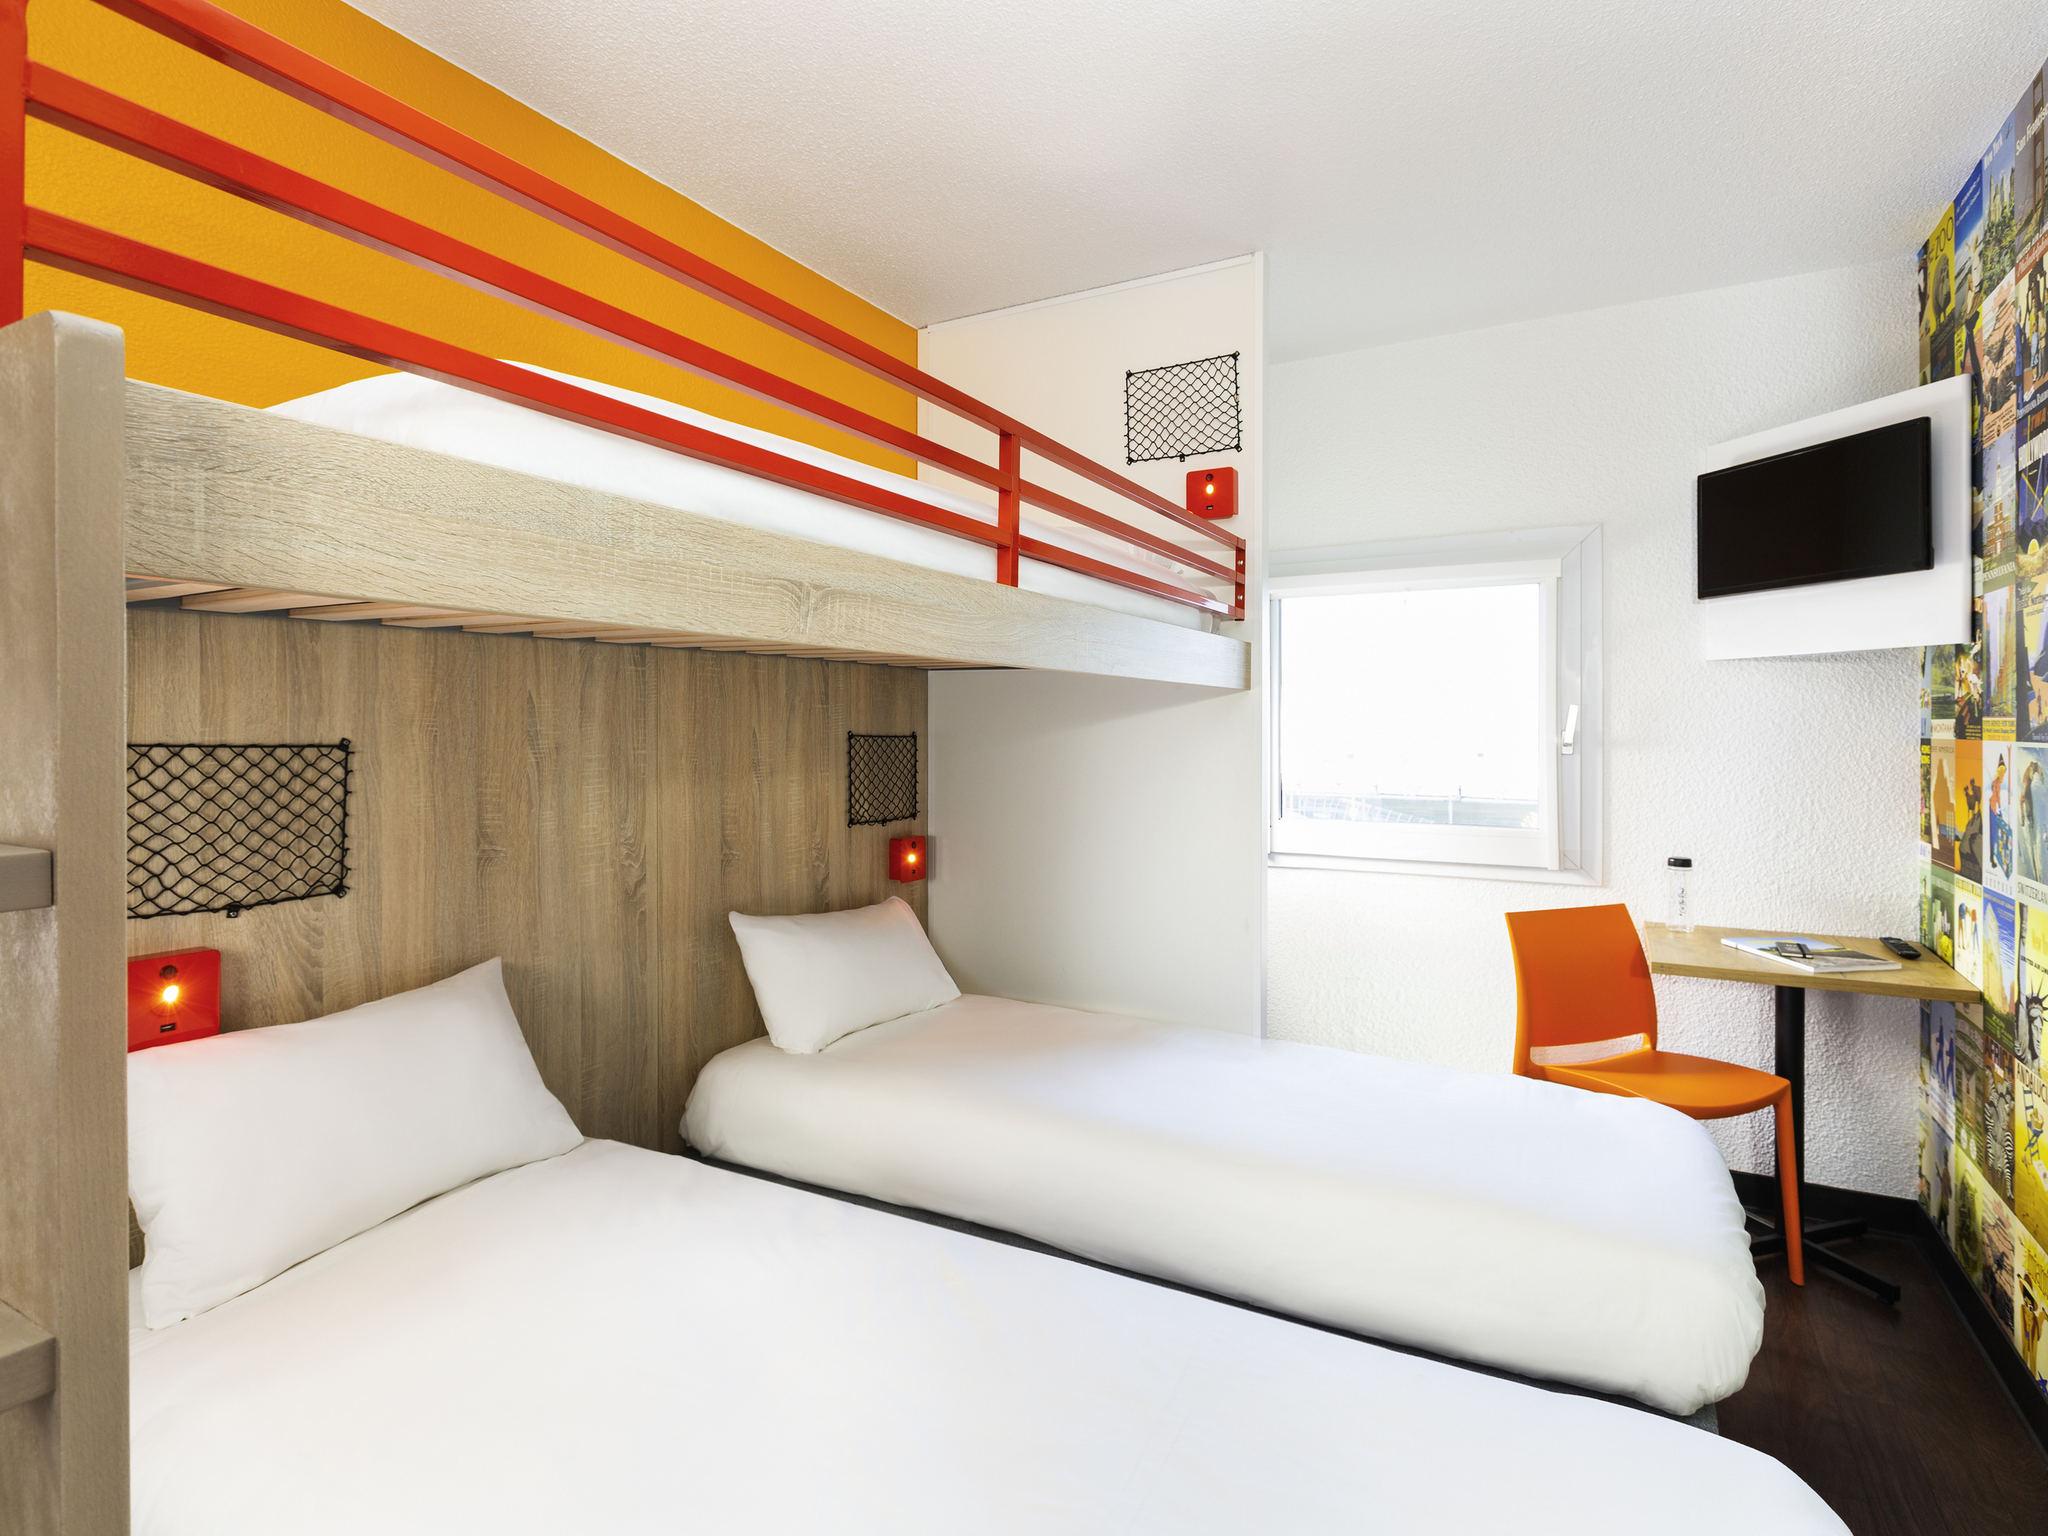 Hotell – hotelF1 Avignon Nord